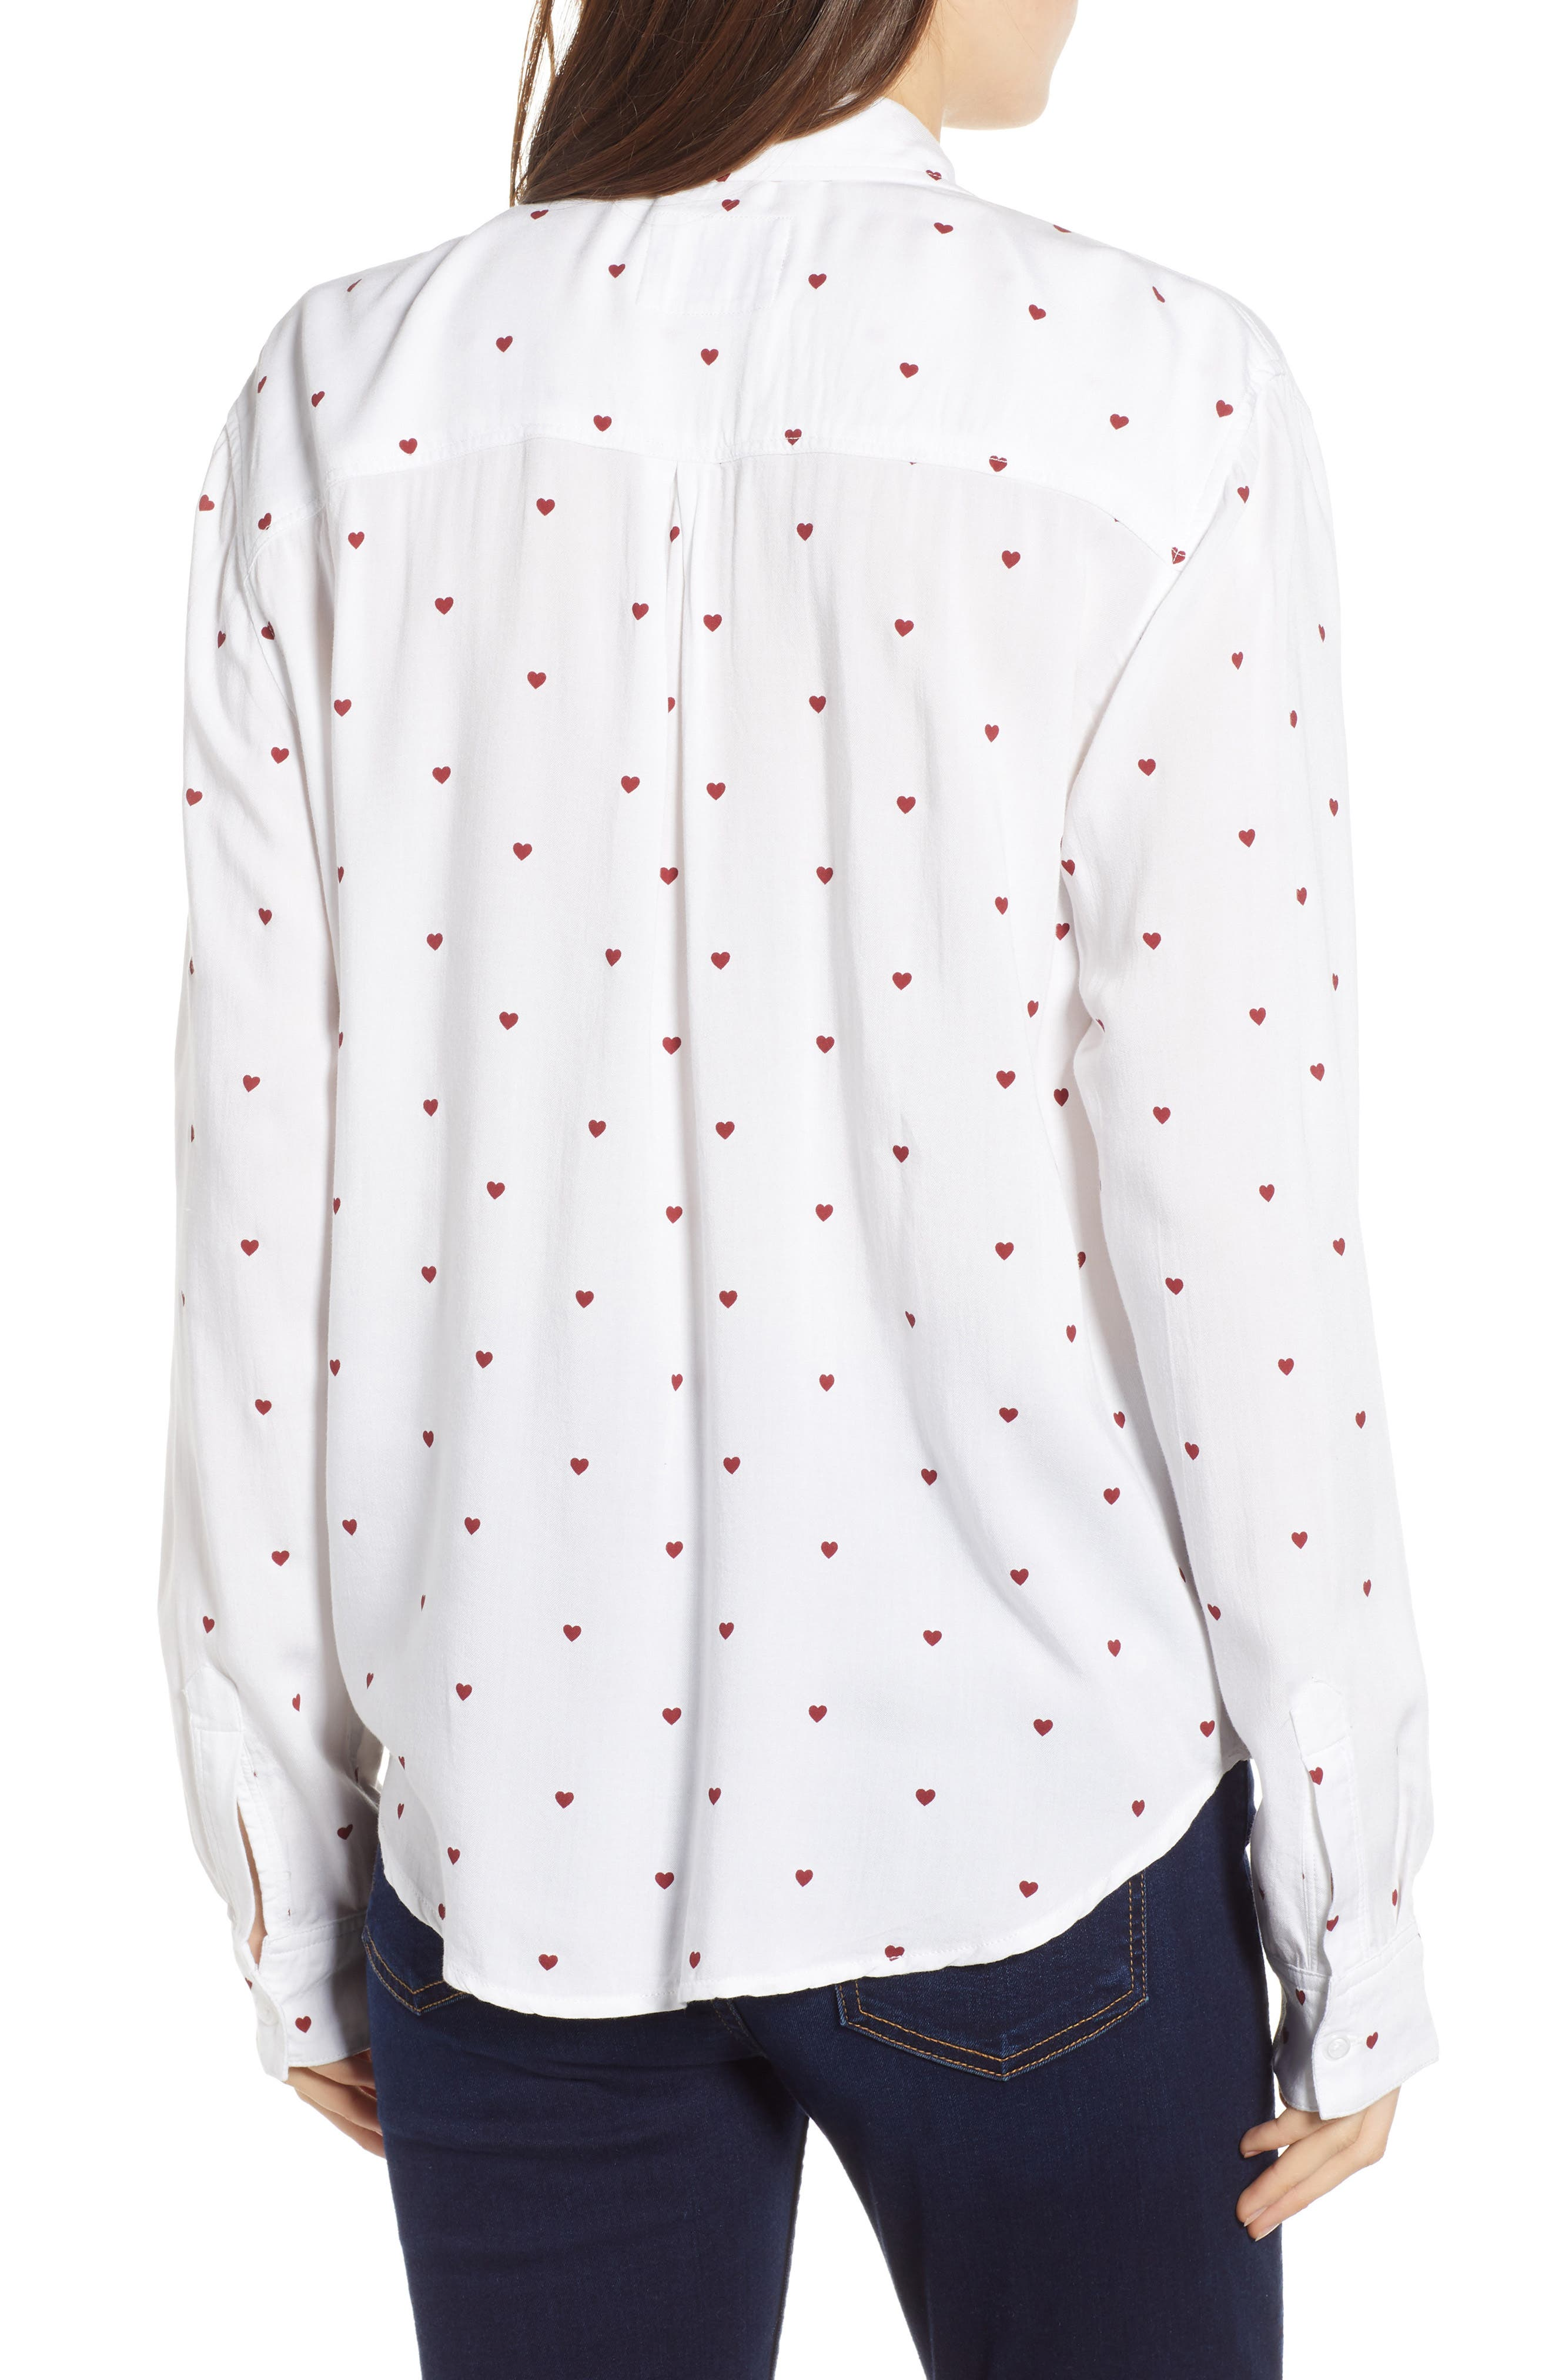 Rocsi Heart Print Shirt,                             Alternate thumbnail 2, color,                             WHITE RED HEARTS